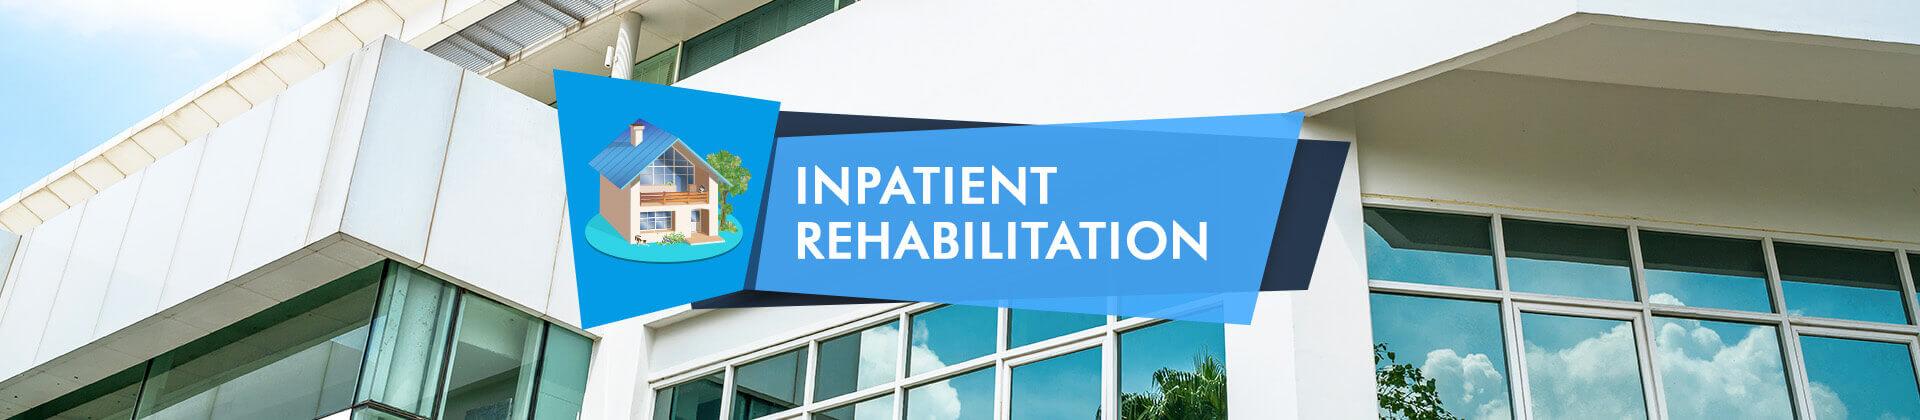 inpatient tratment facilities